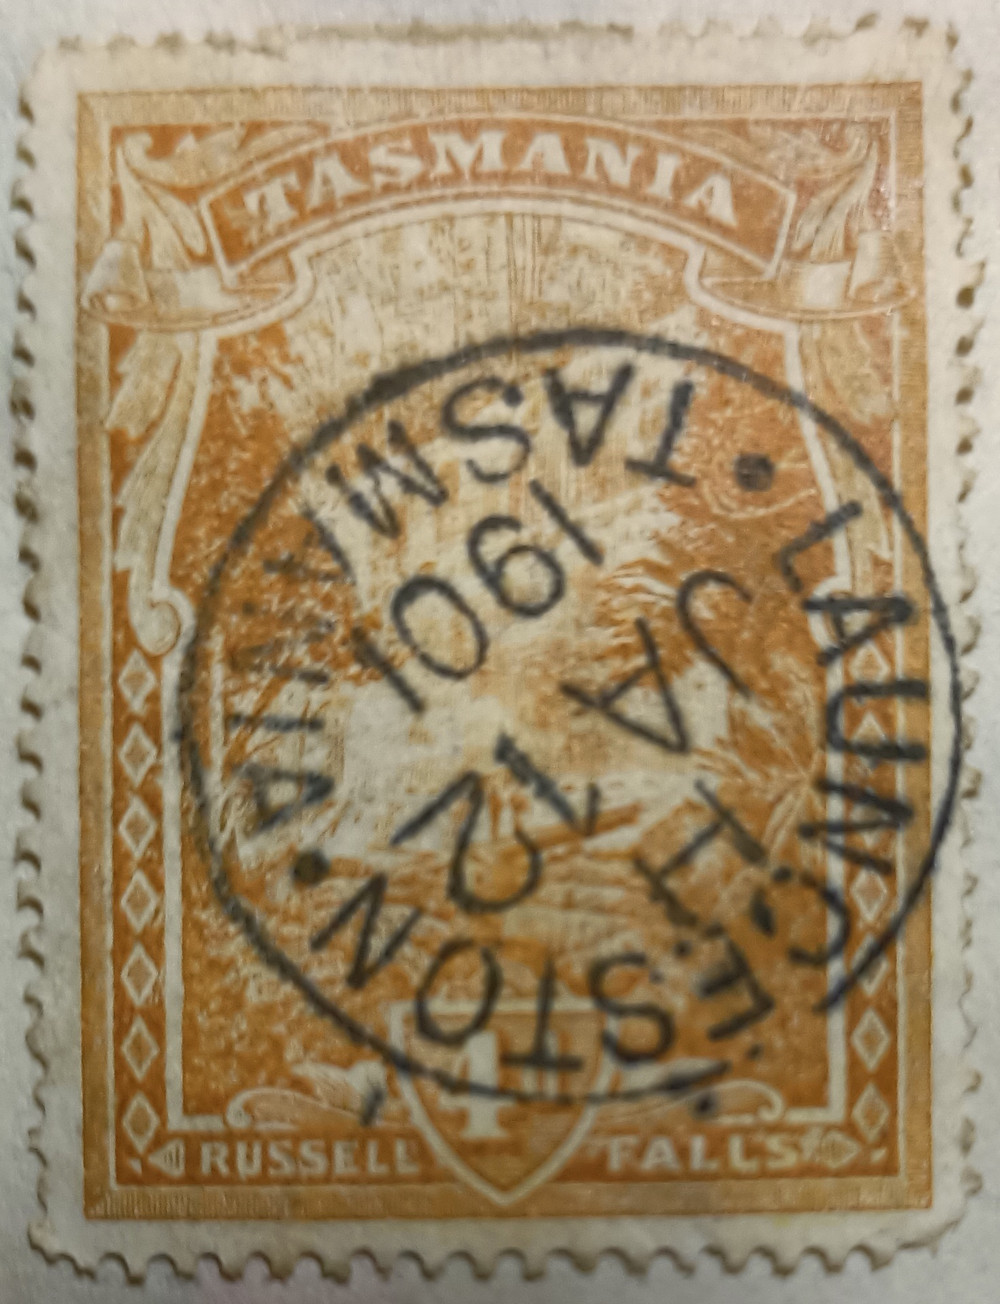 Tasmanian stamp (Russell Falls) postmarked 12 Jan 1901, Launceston